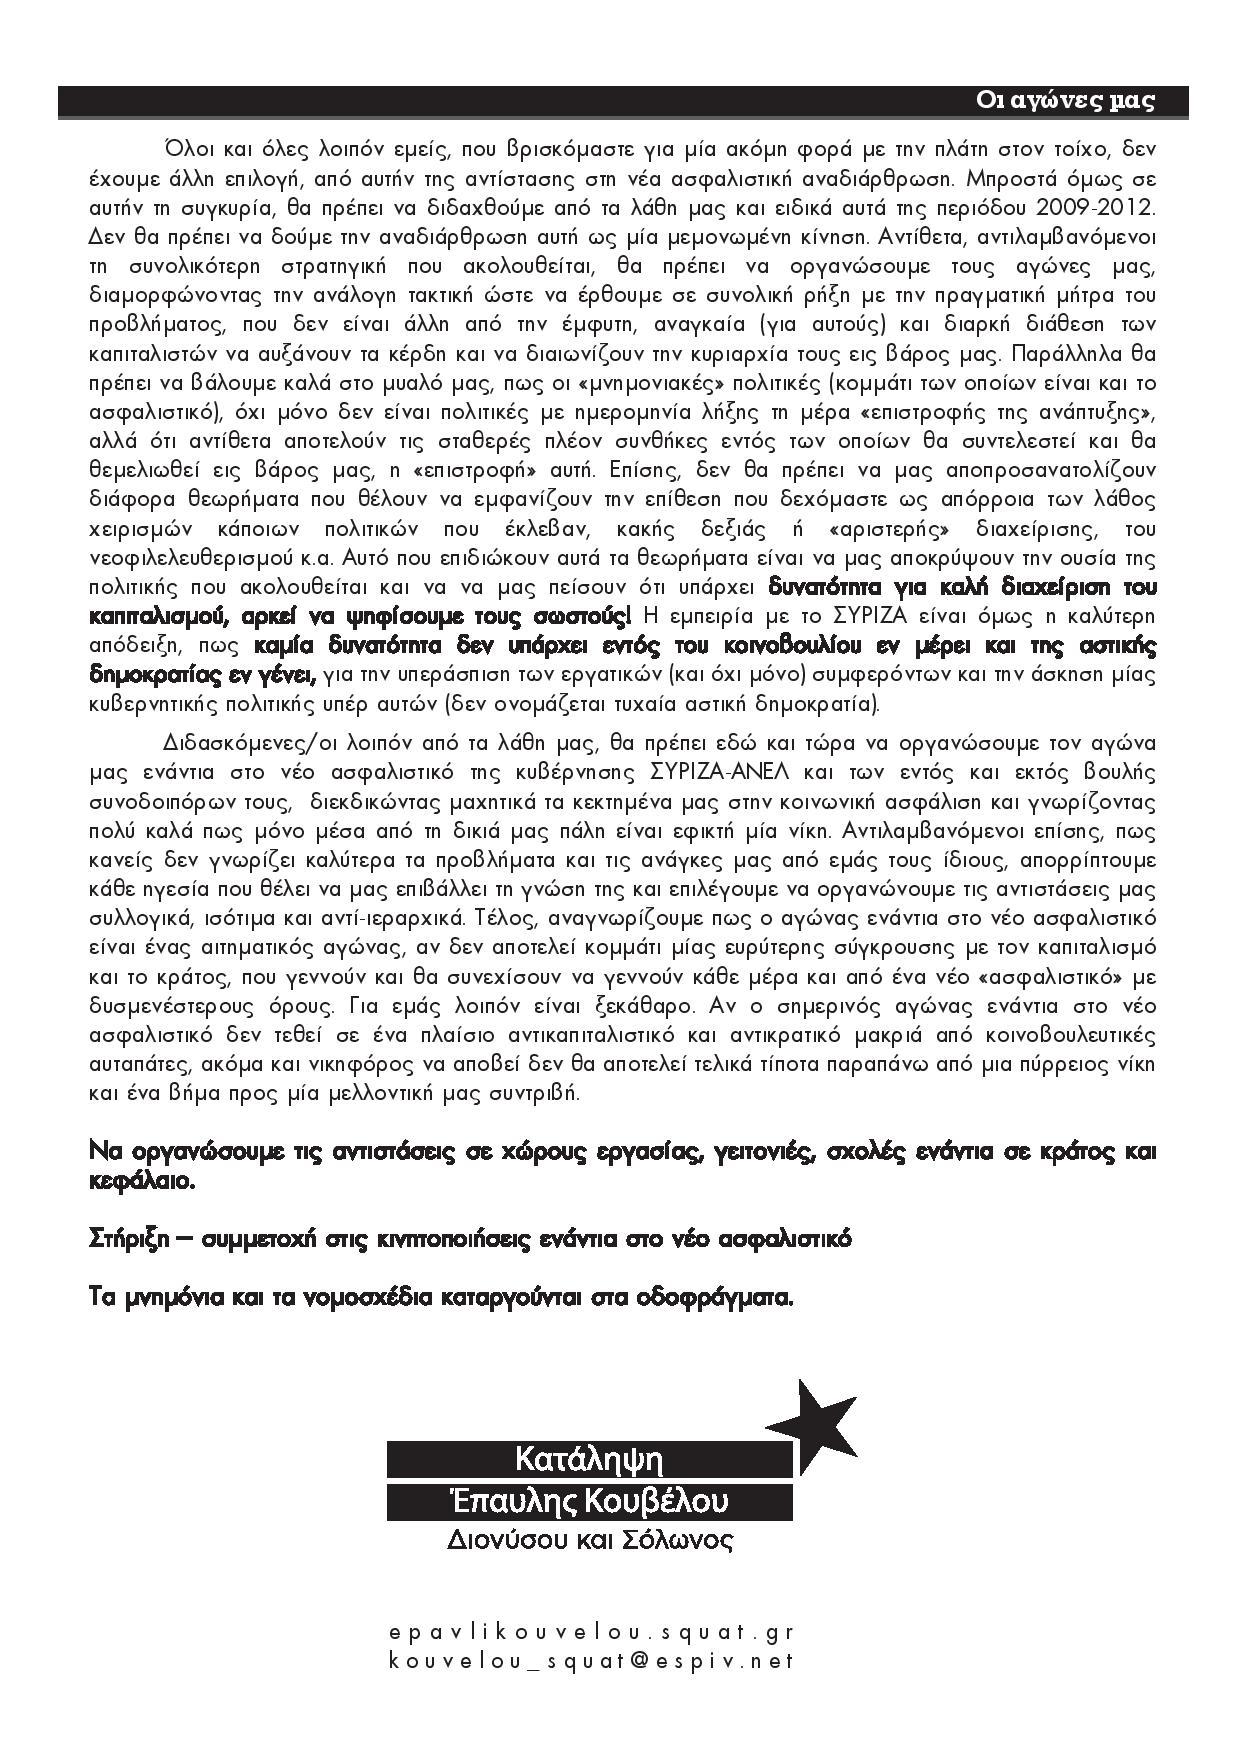 asfalistiko-page-002